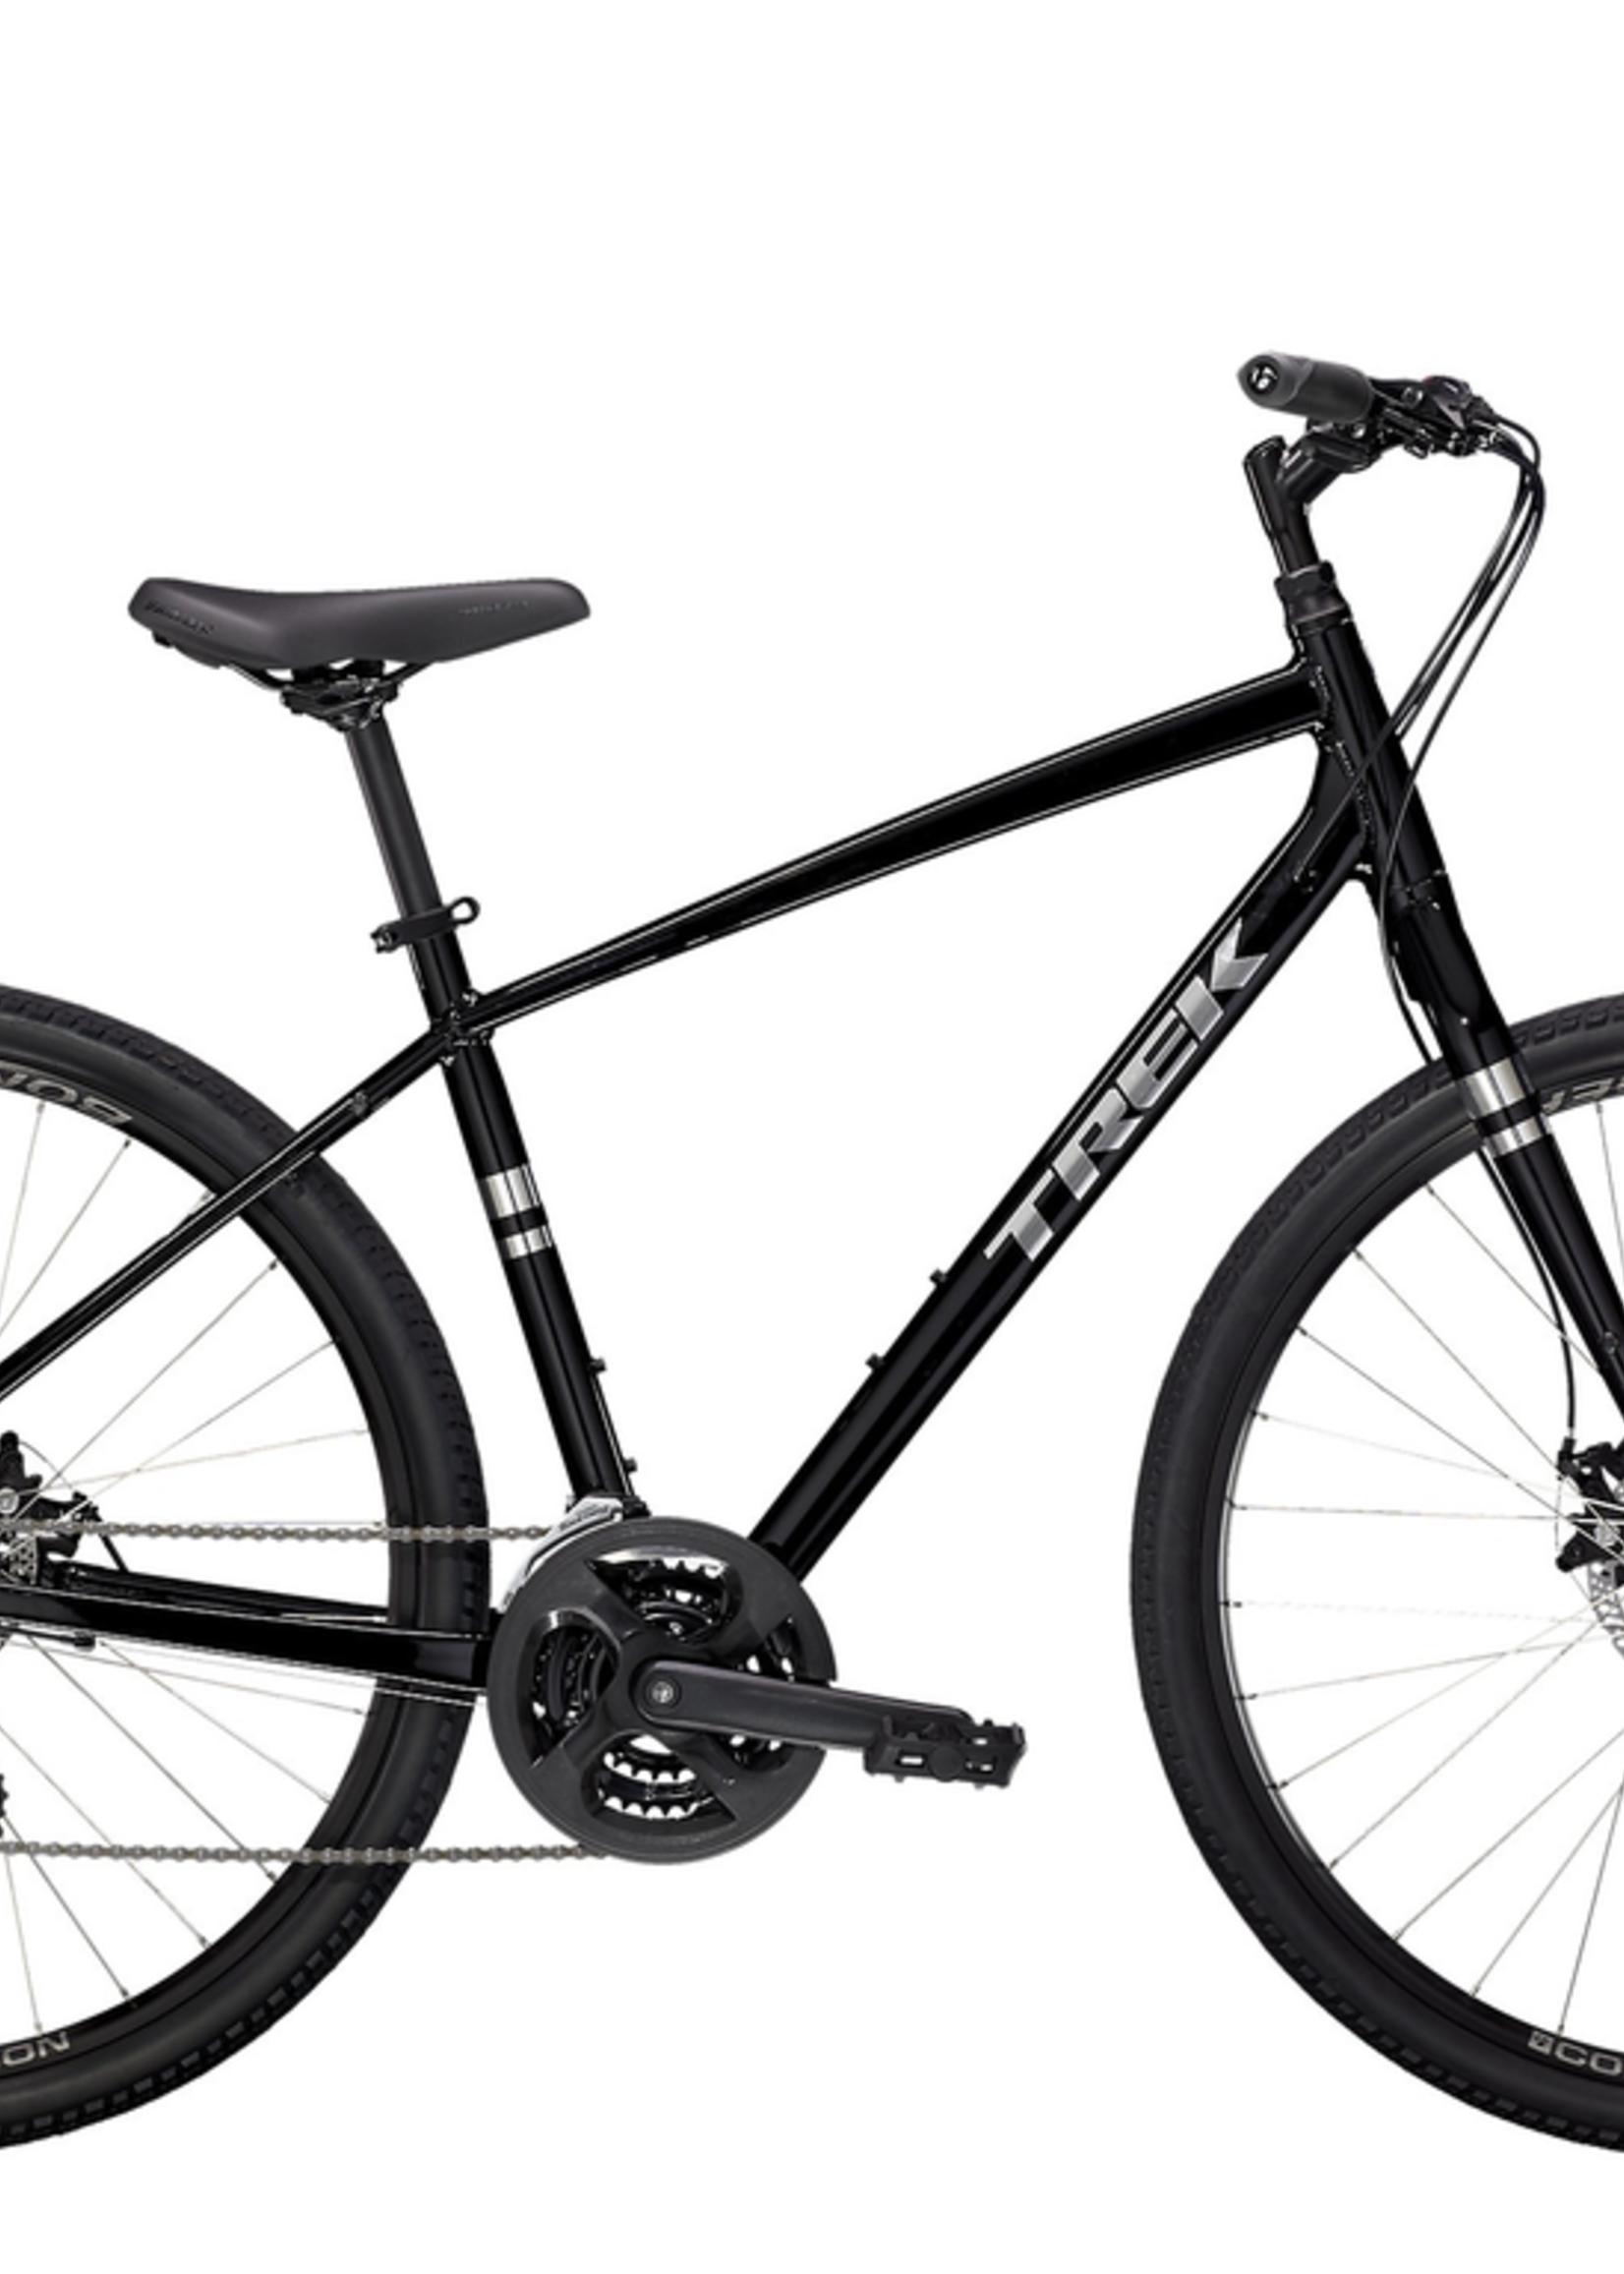 TREE BICYCLE CO TREK - VERVE 1 DISC - L (20)